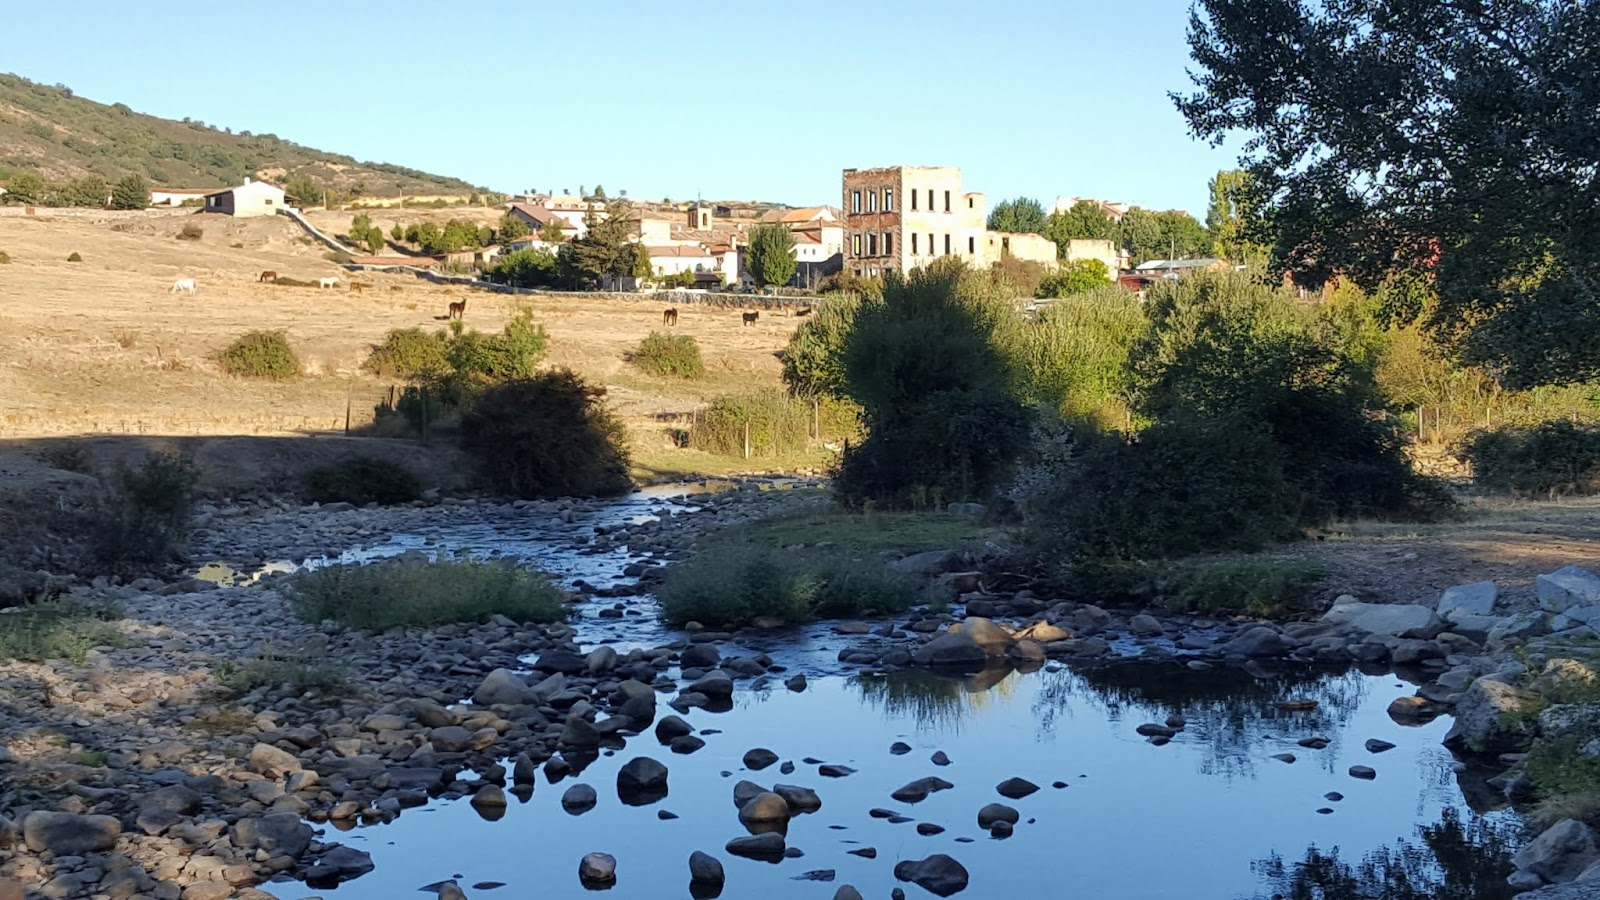 Granja de San Ildefonso